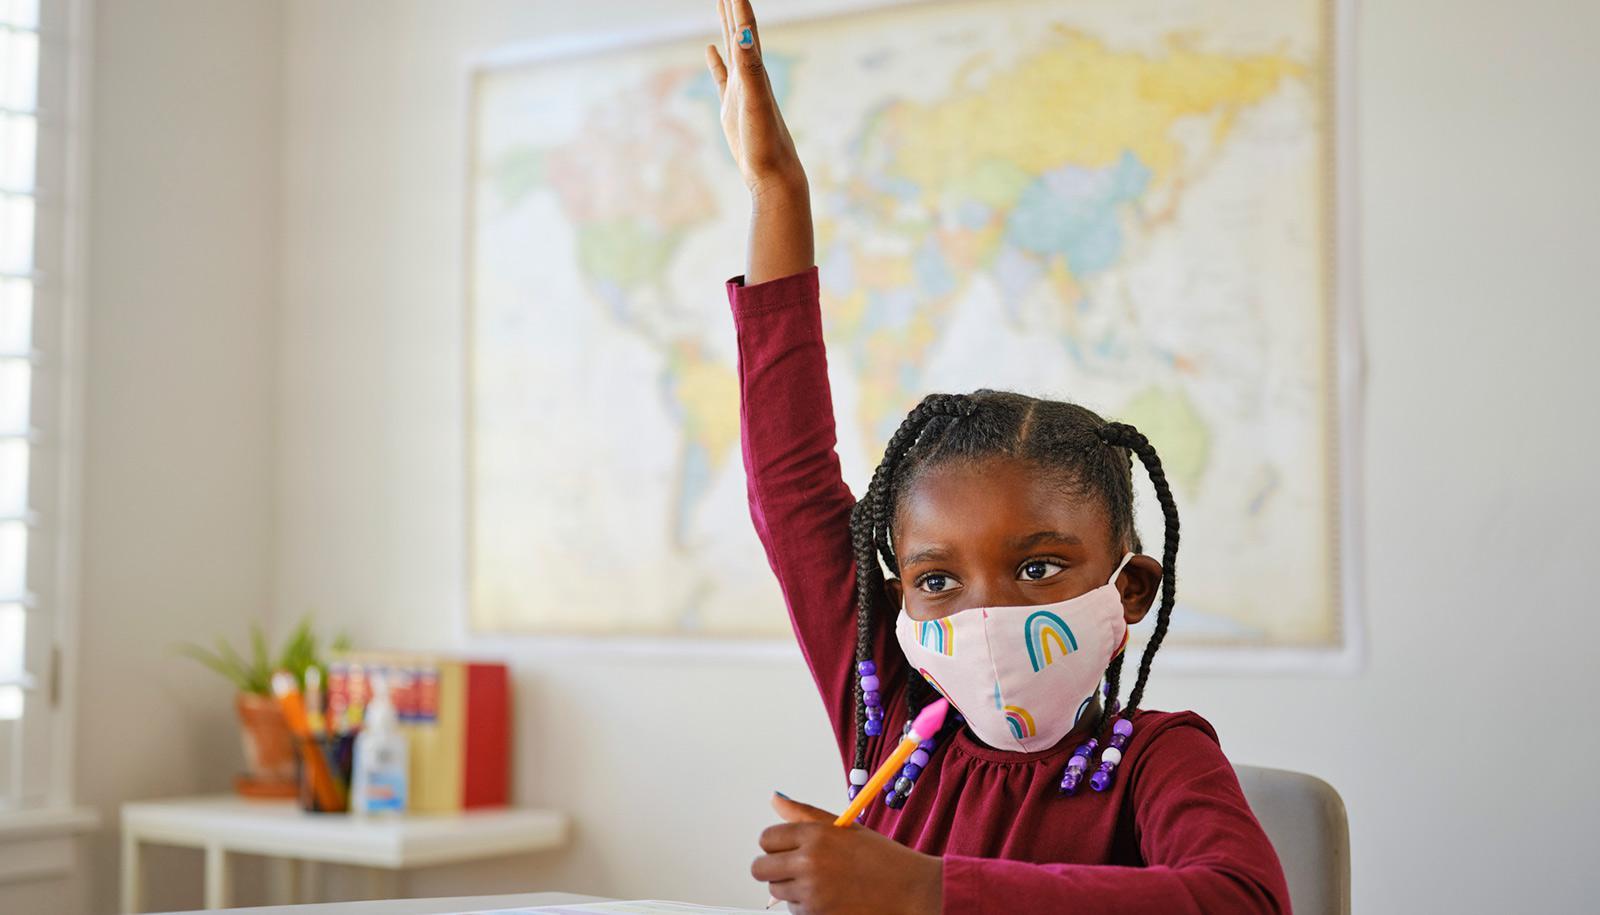 Black child in rainbow mask raises hand in classroom